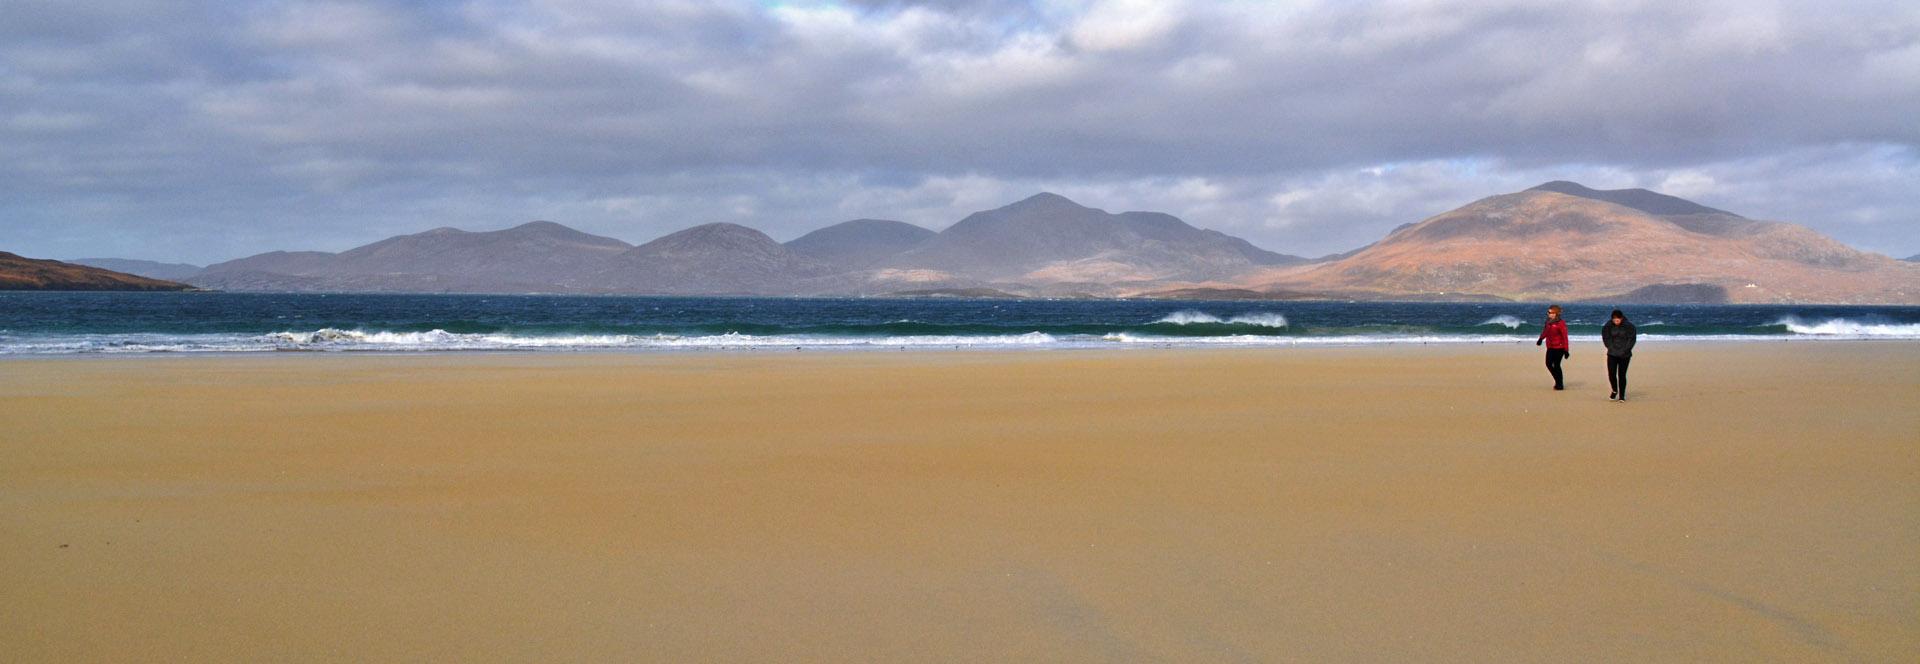 Western Isles s Best Over 70 Dating Website - Meet Singles Over 70 Today